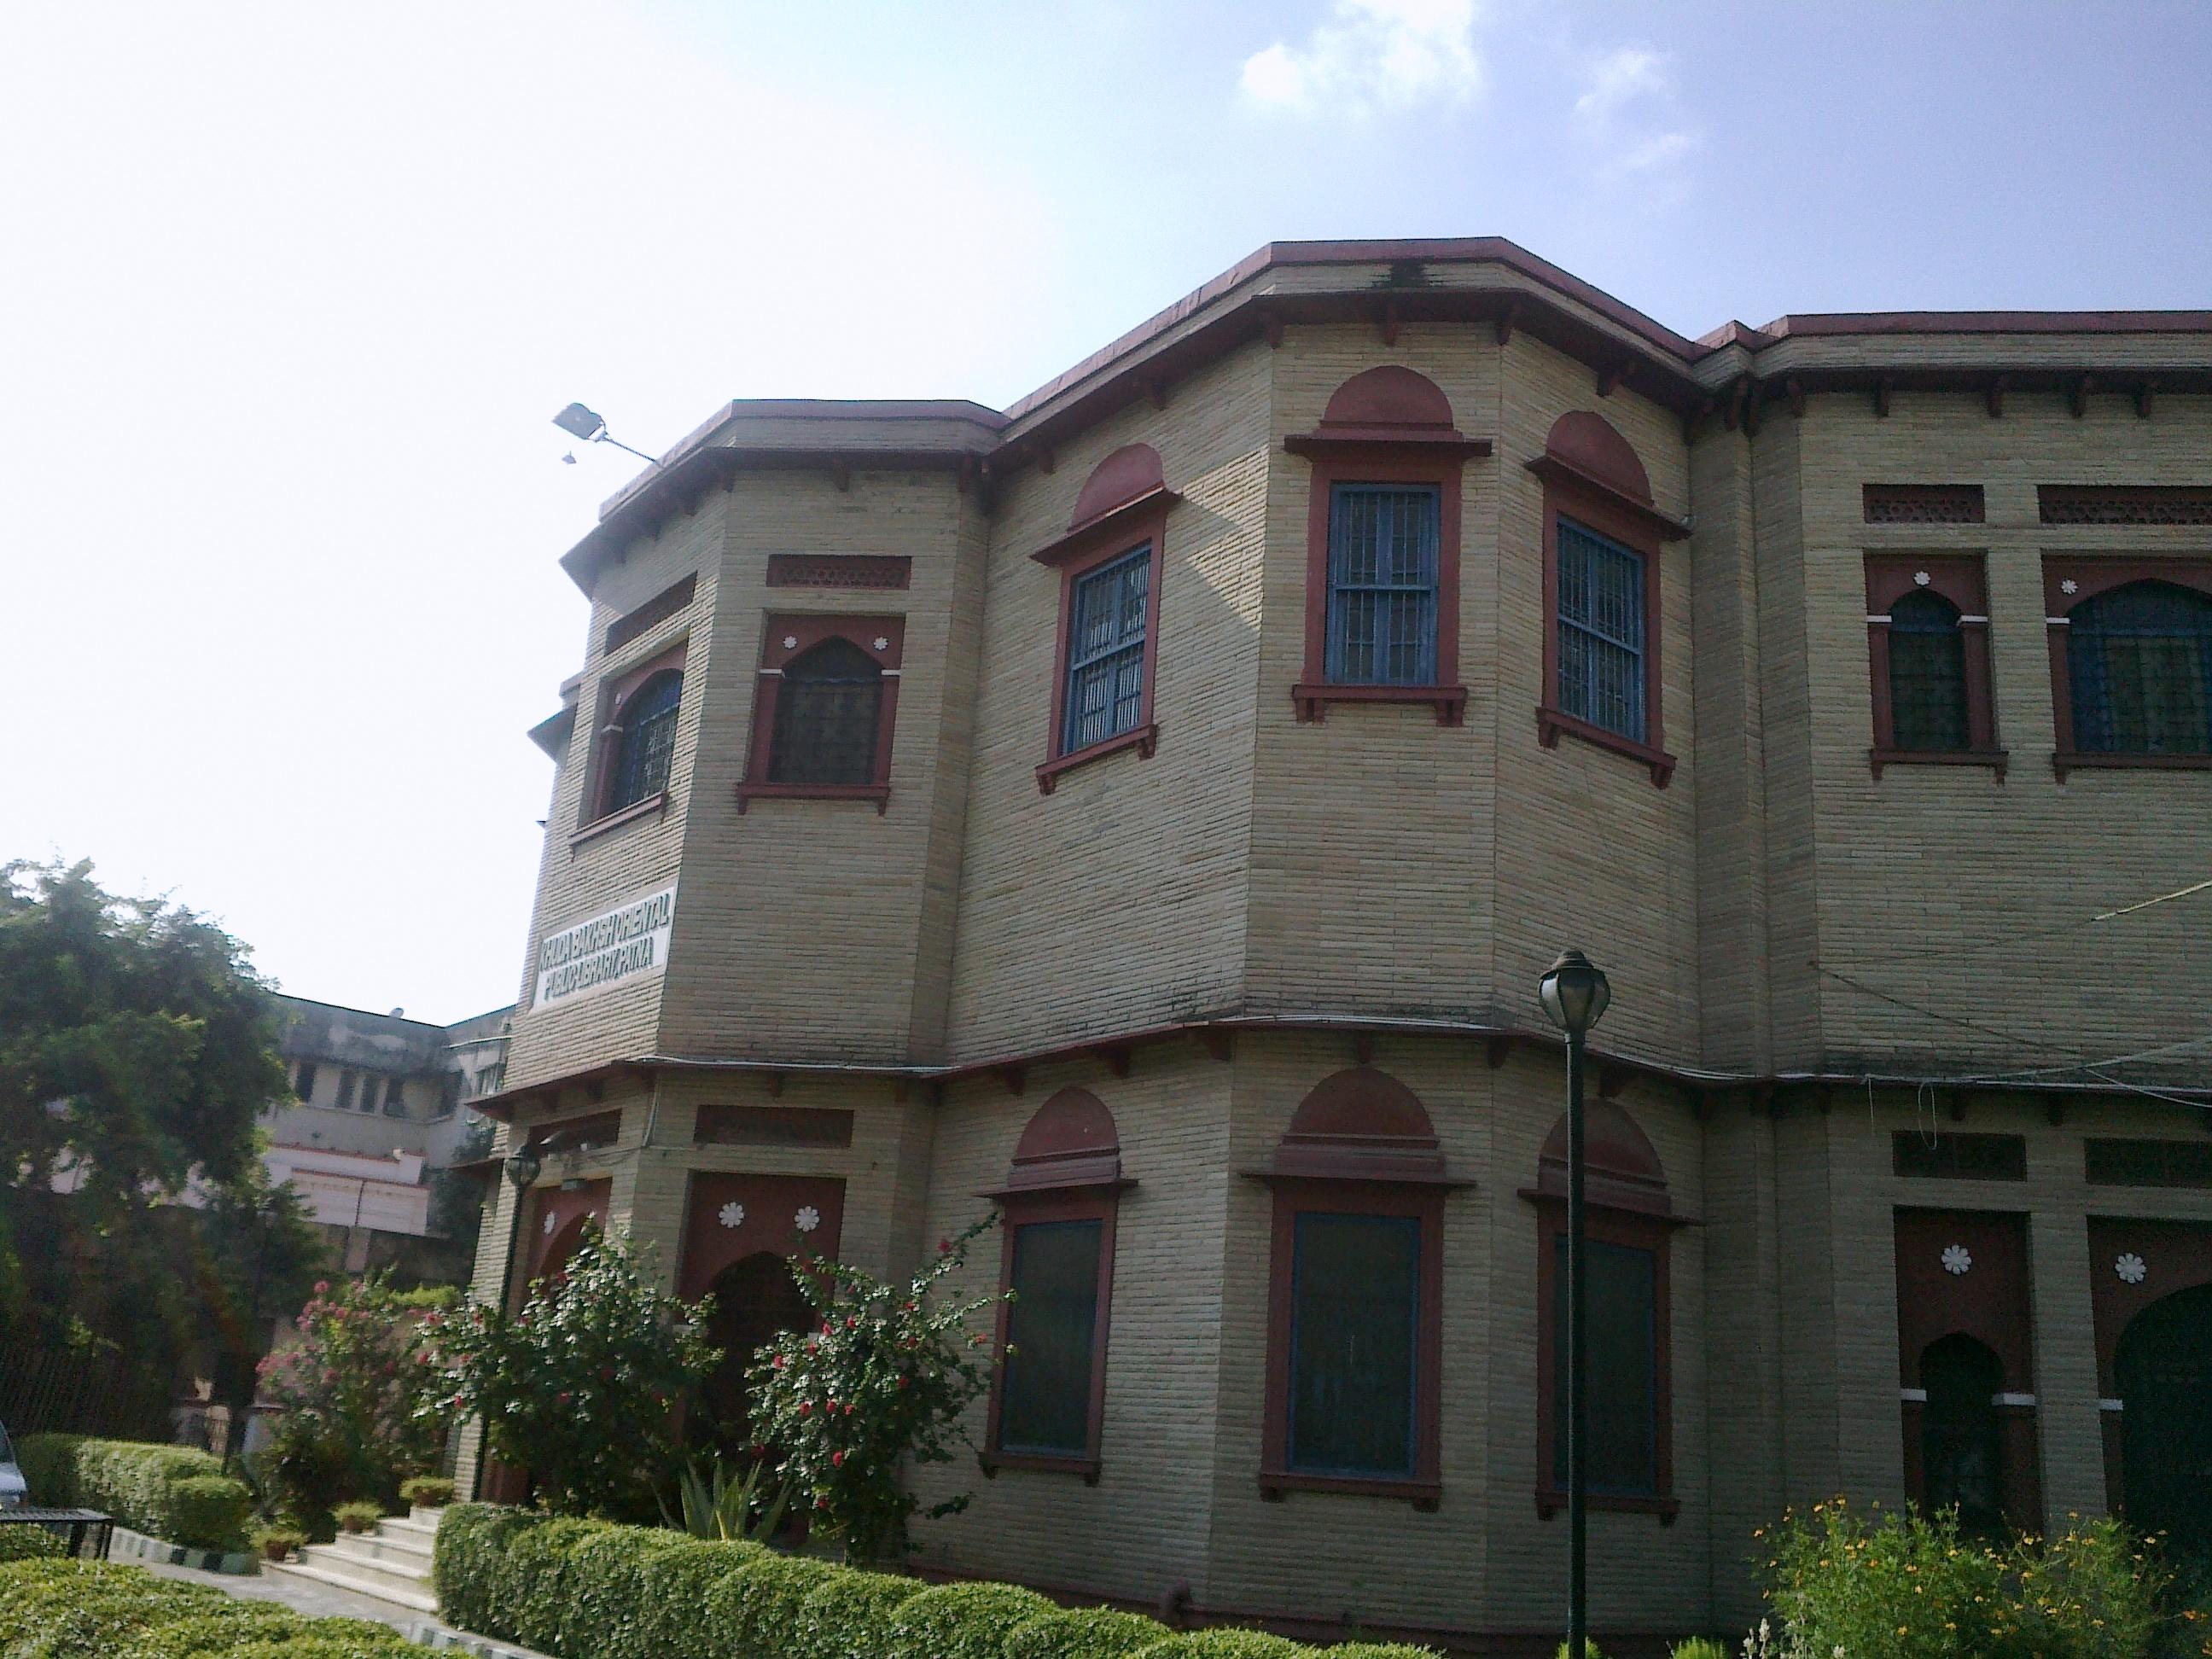 Khudabaksh Library